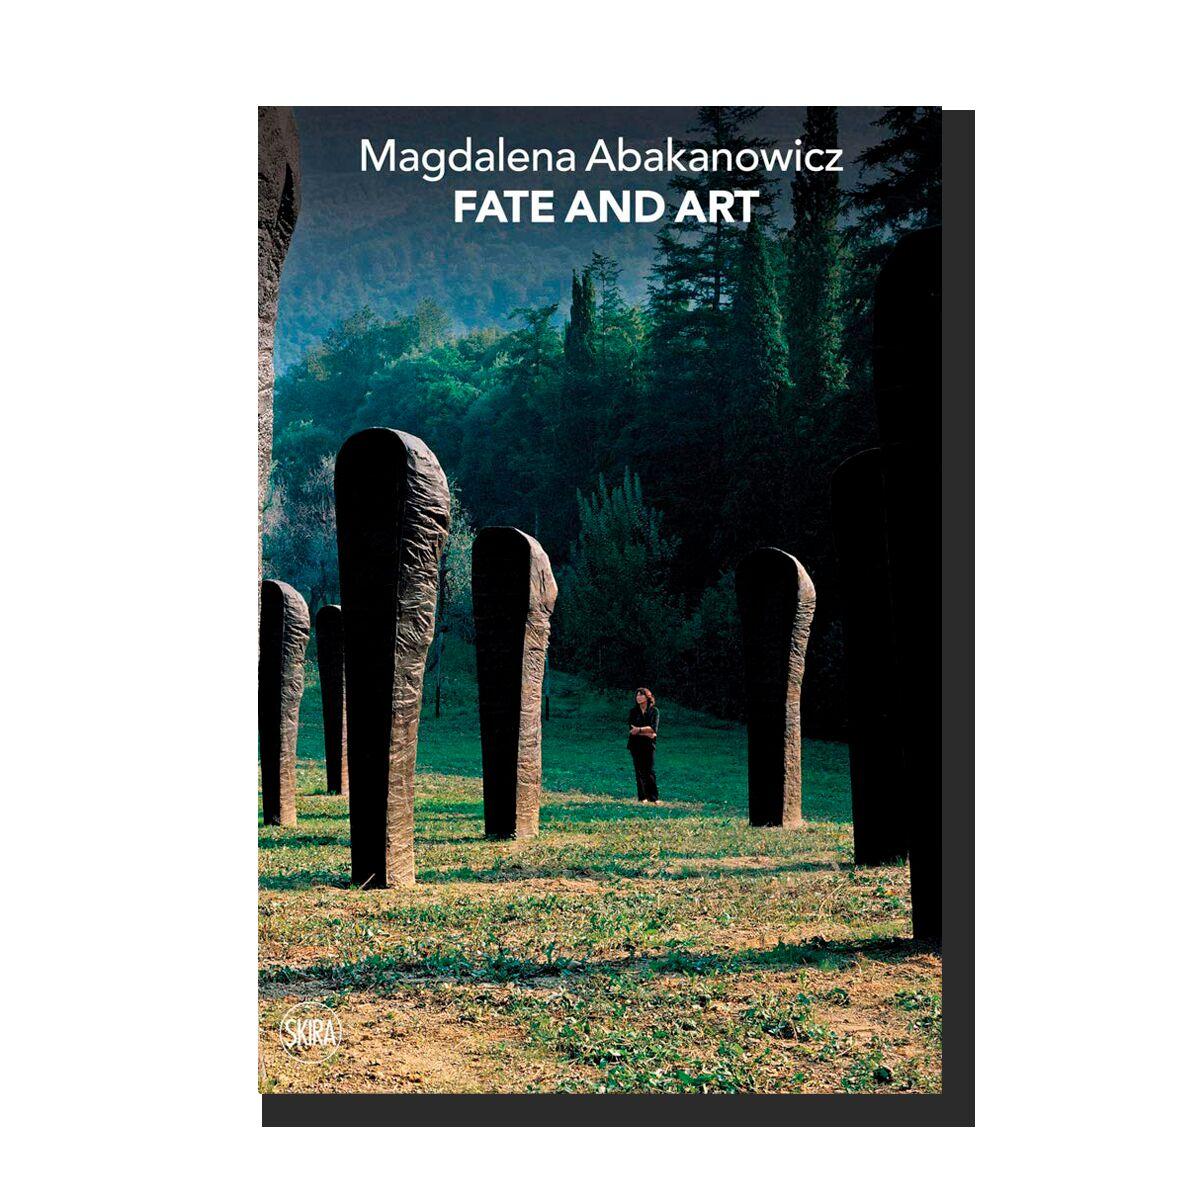 Magdalena Abakanowicz: Fate and Art: Monologue